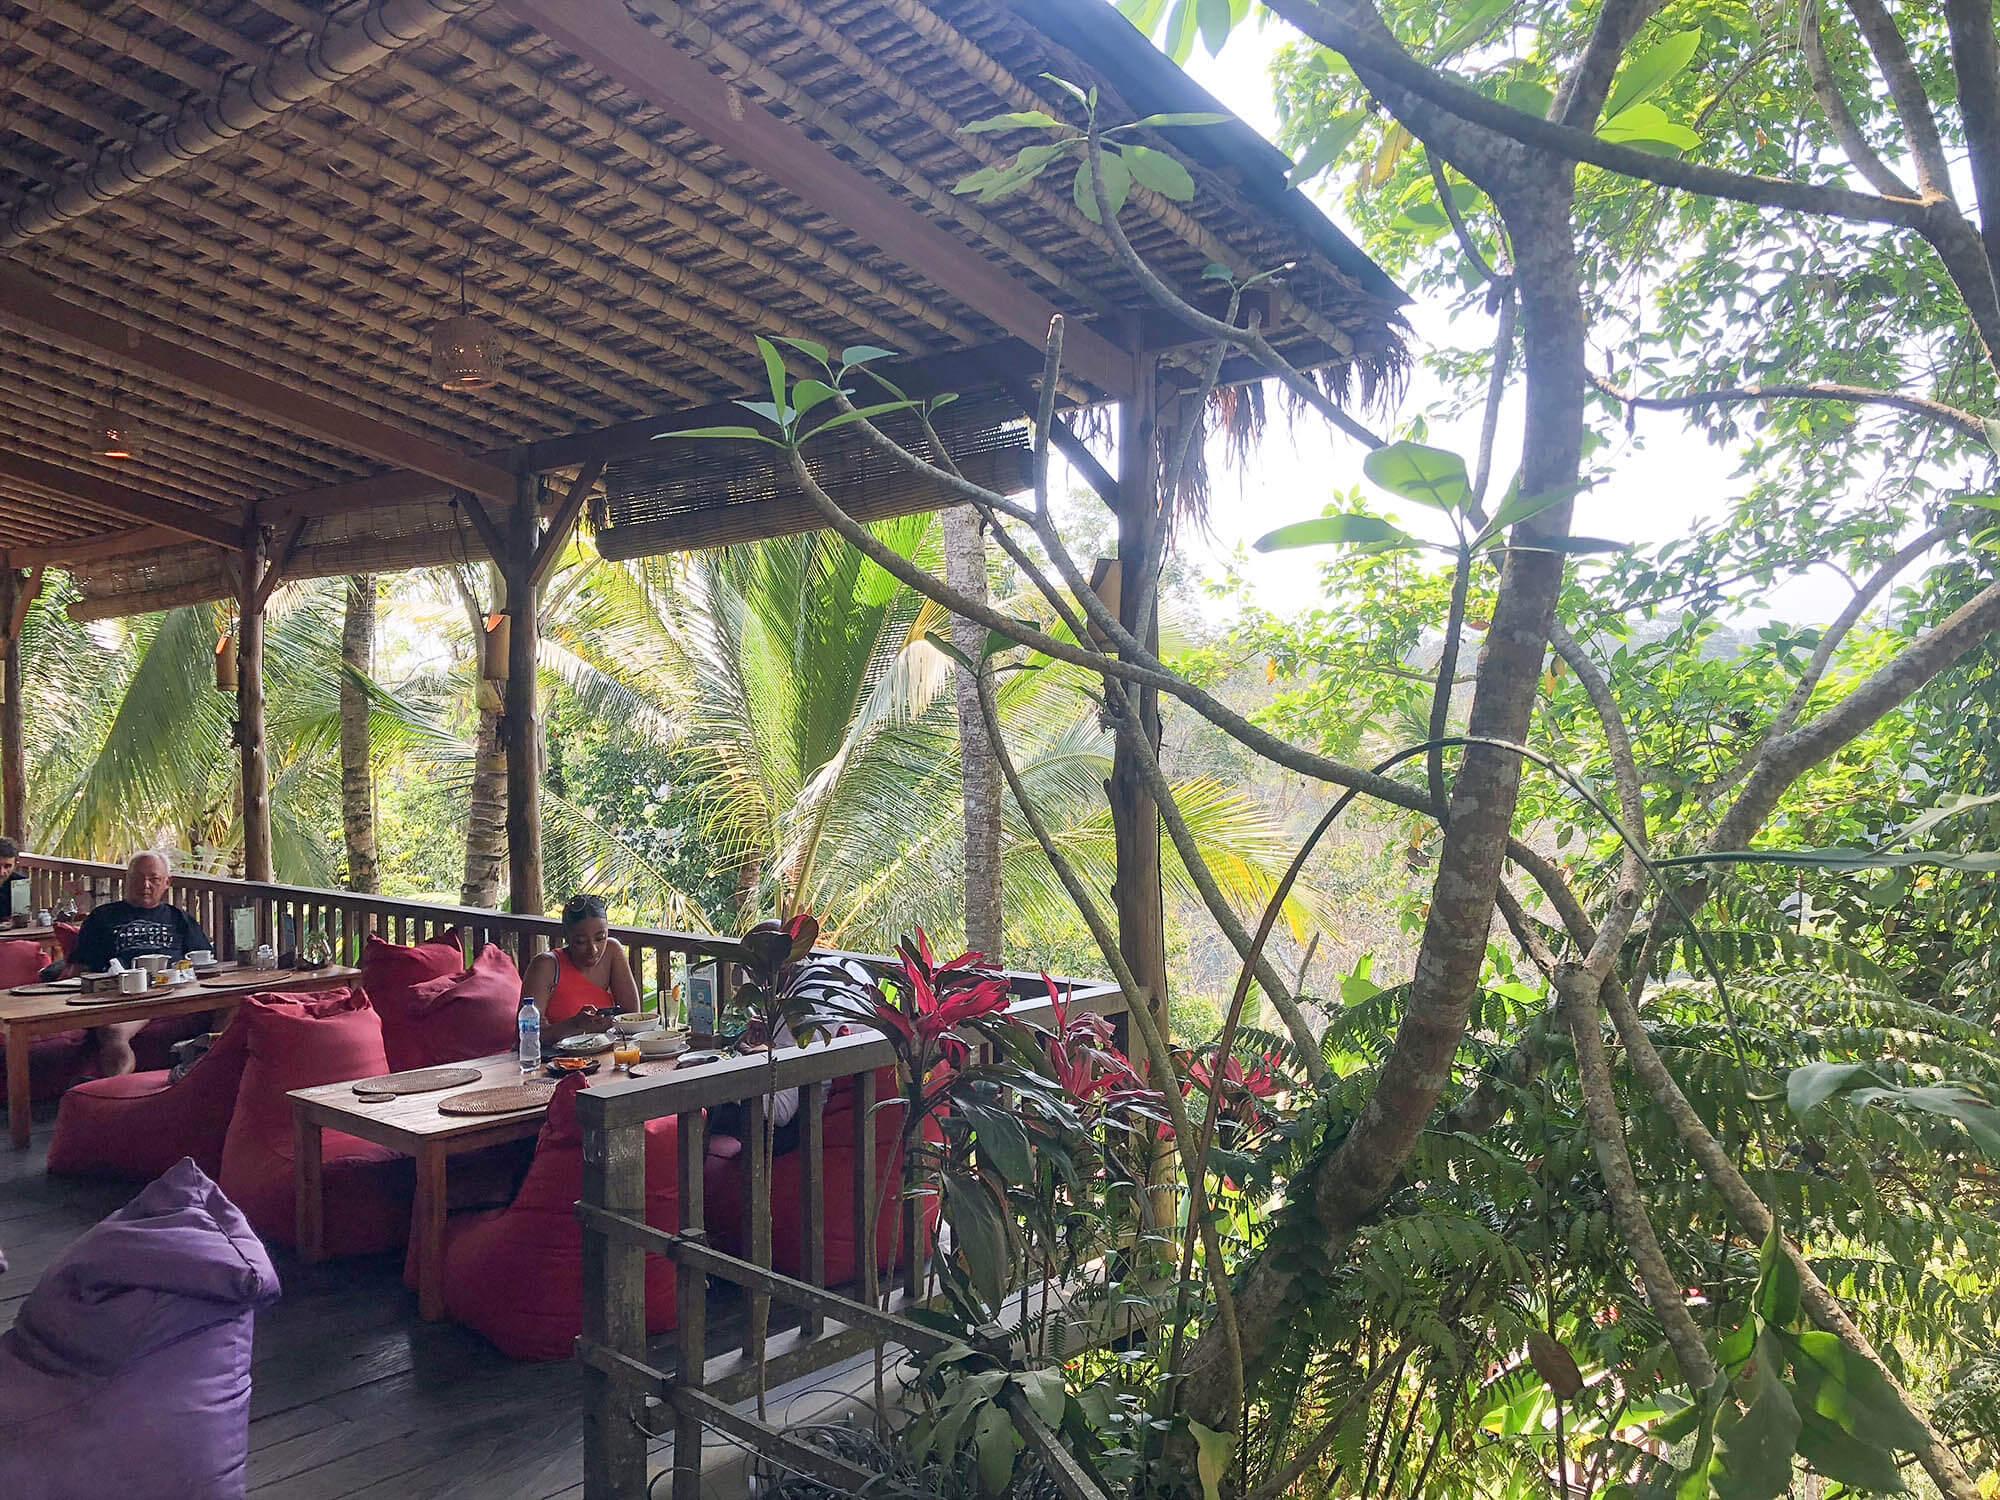 dAlas餐廳戶外懶人椅區1